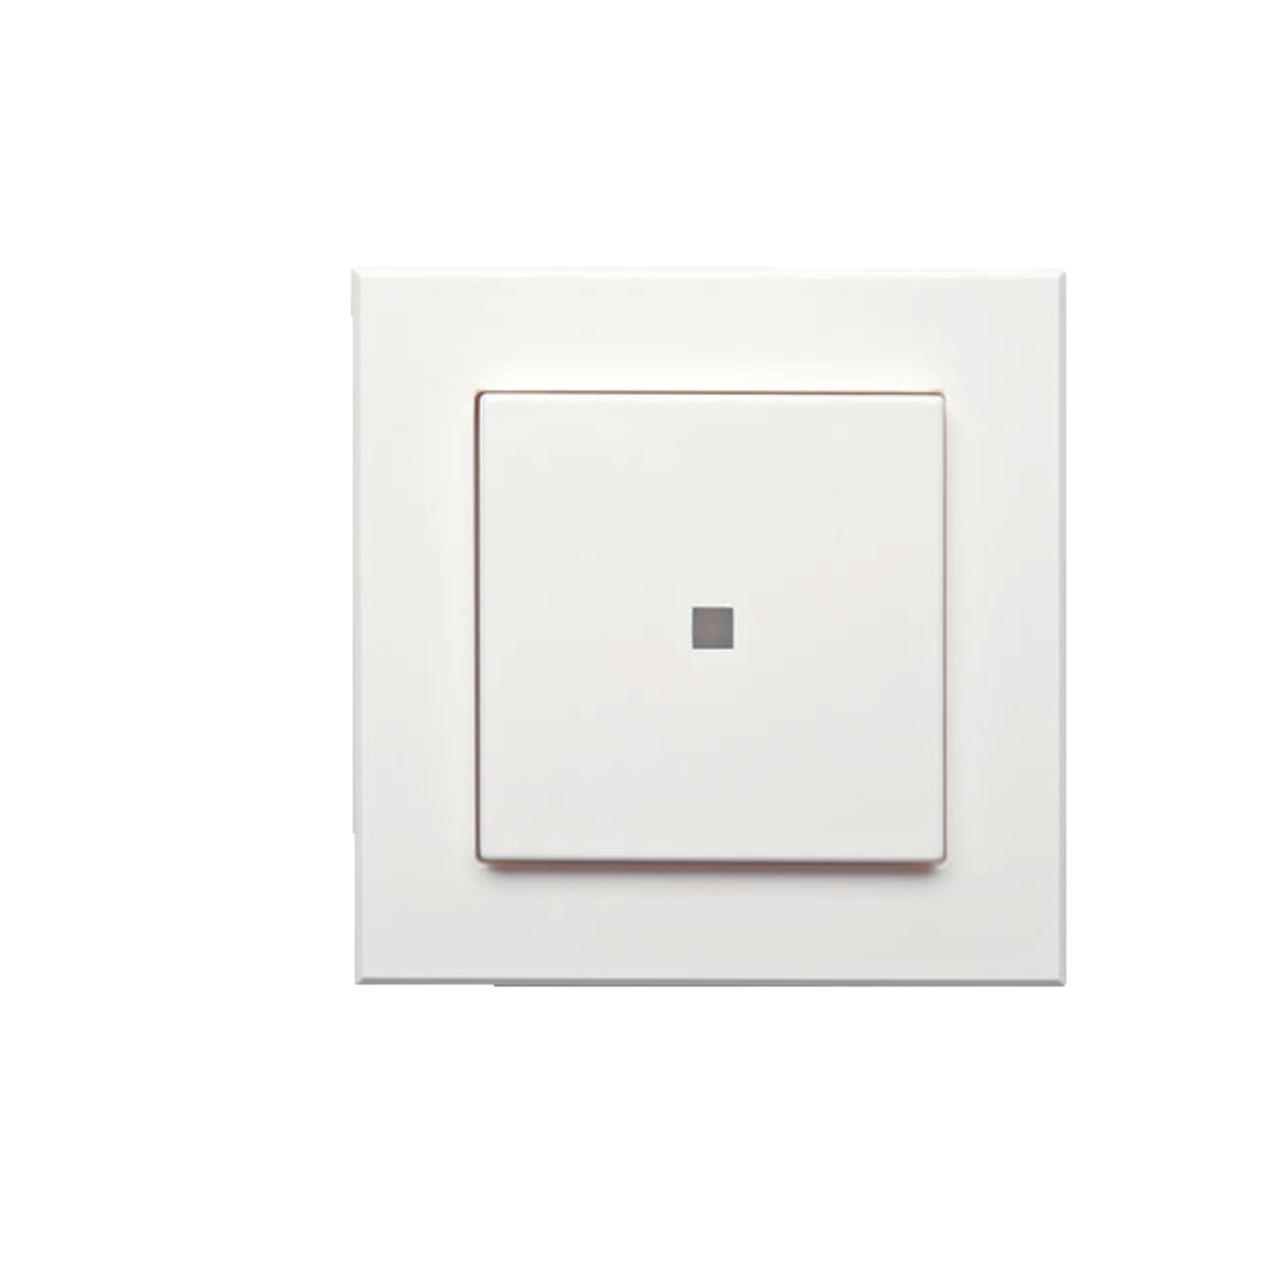 Homematic Funk-Wandtaster 2fach HM-PB-2-WM55-2 fund-252 r Smart Home - Hausautomation